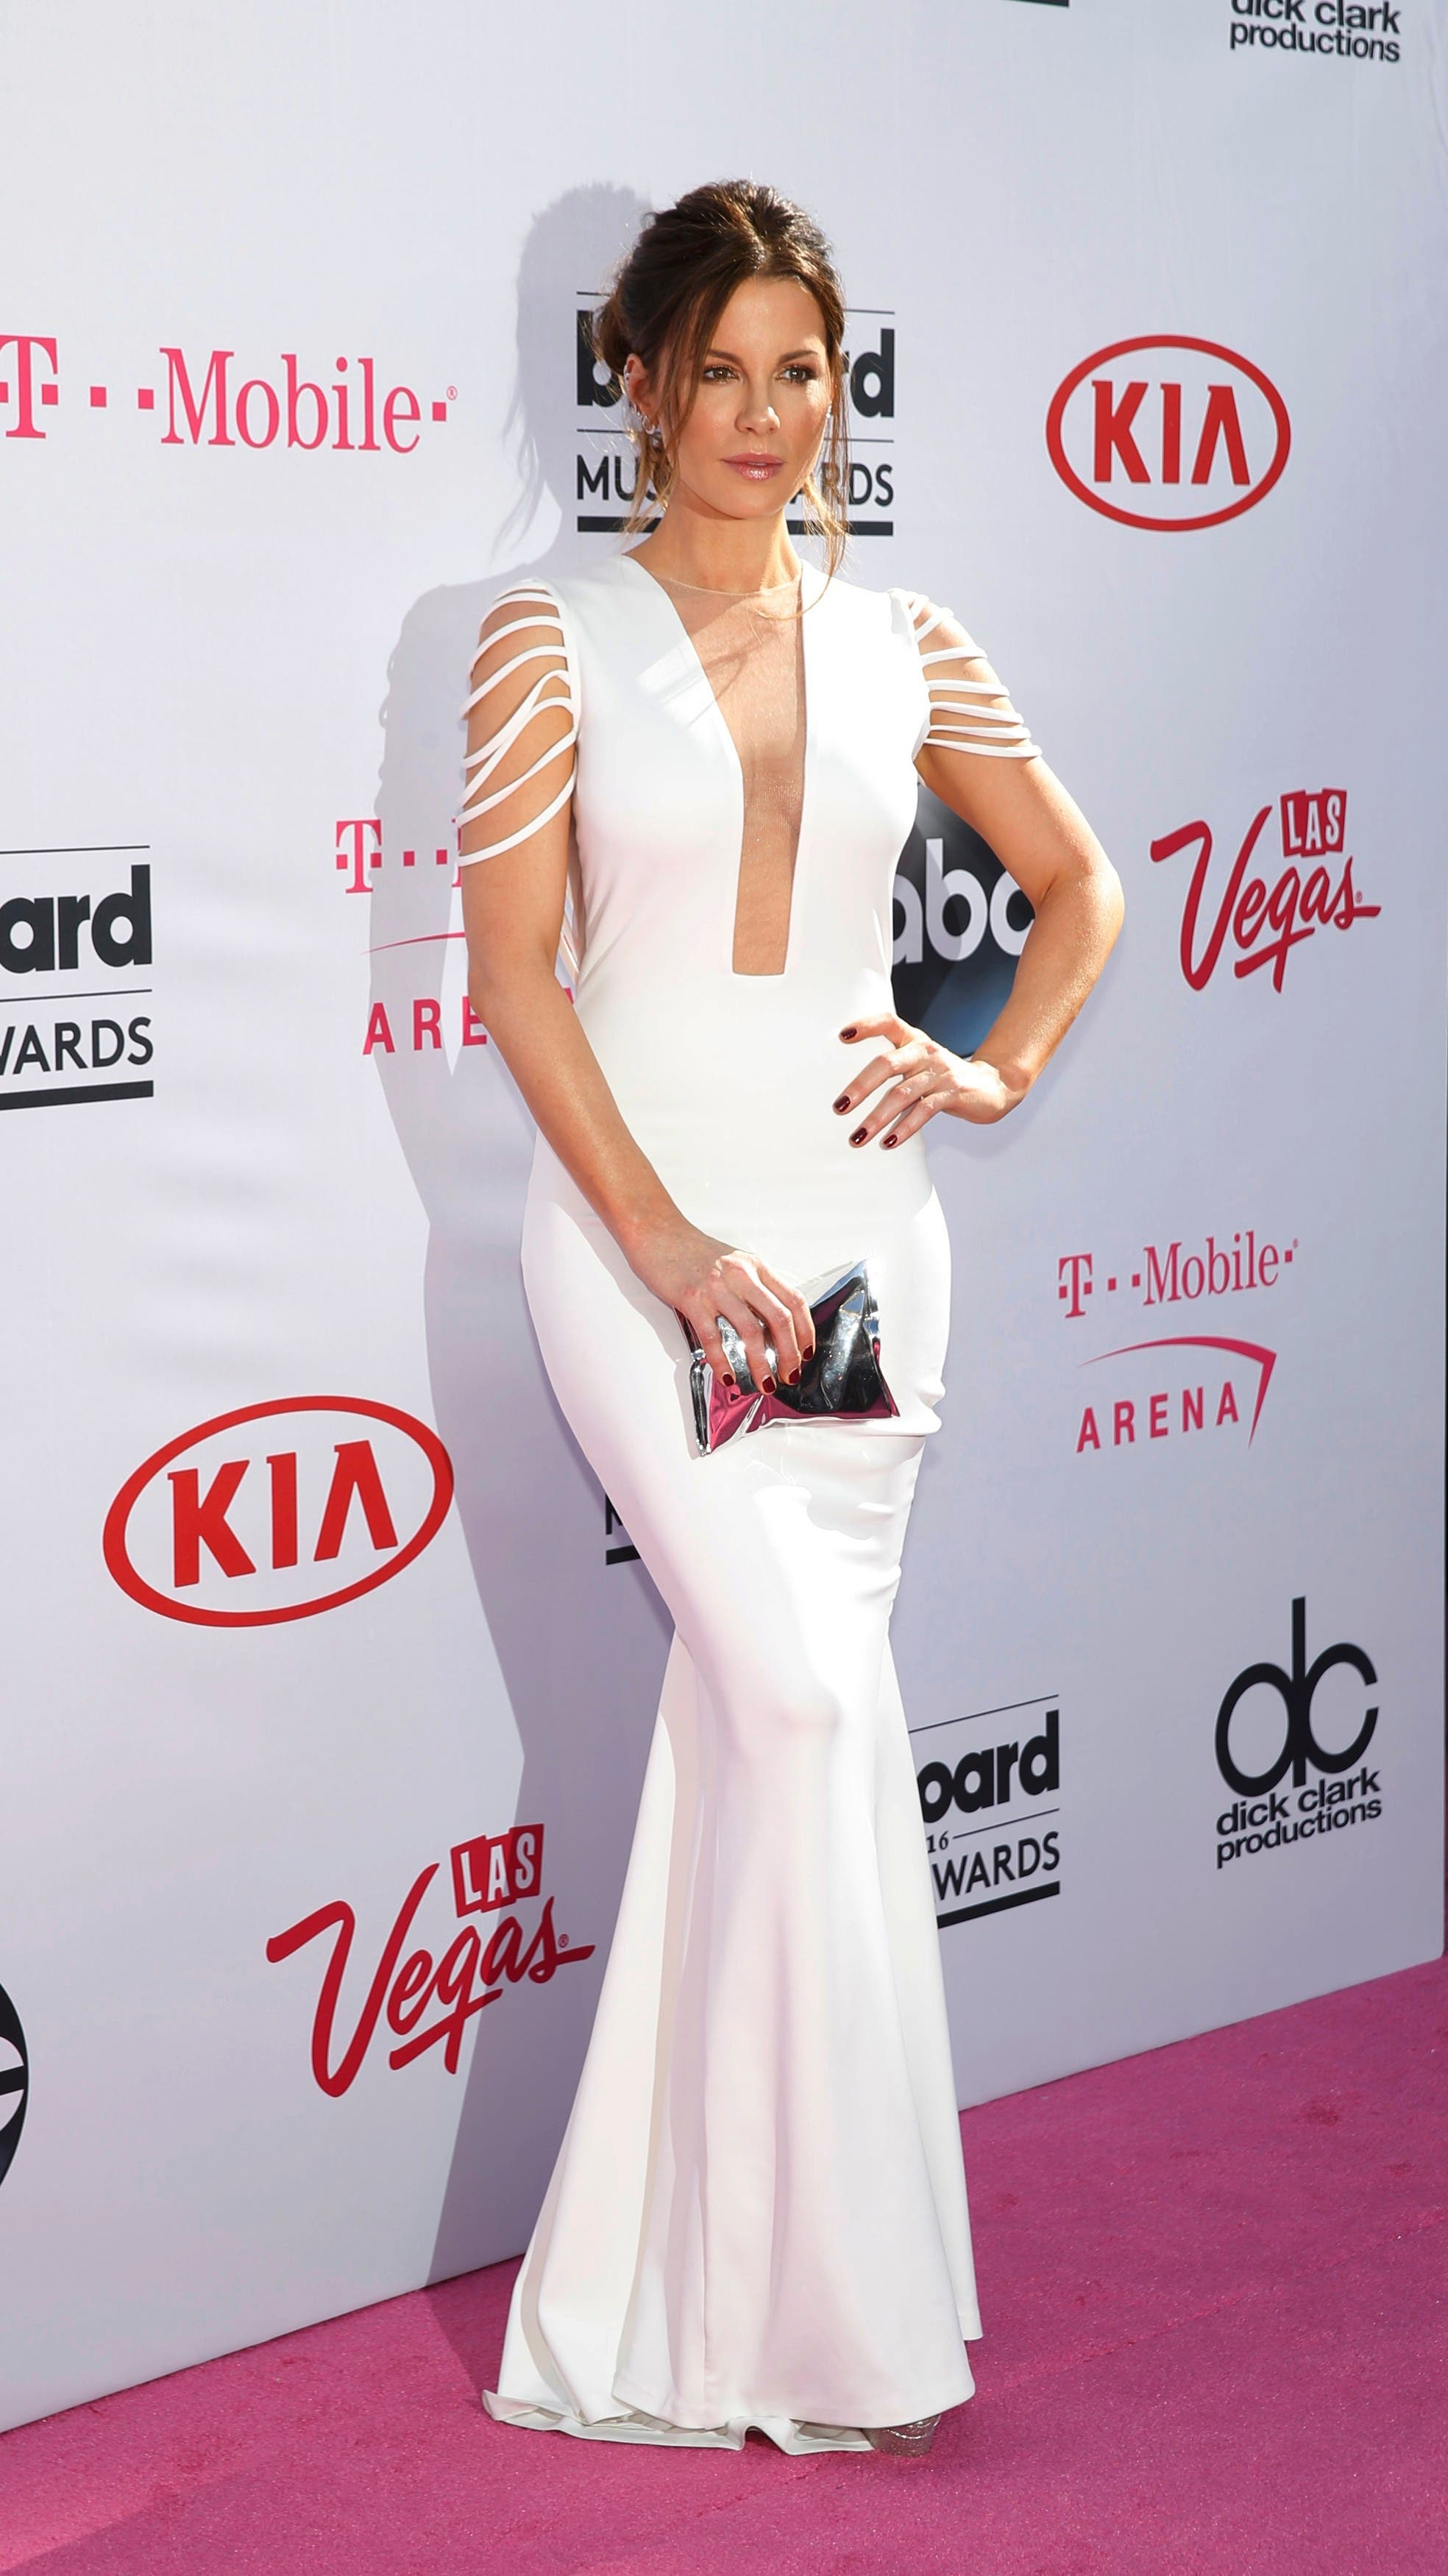 Actress Kate Beckinsale arrives at the 2016 Billboard Awards in Las Vegas, Nevada, US, May 22, 2016. (Reuters)